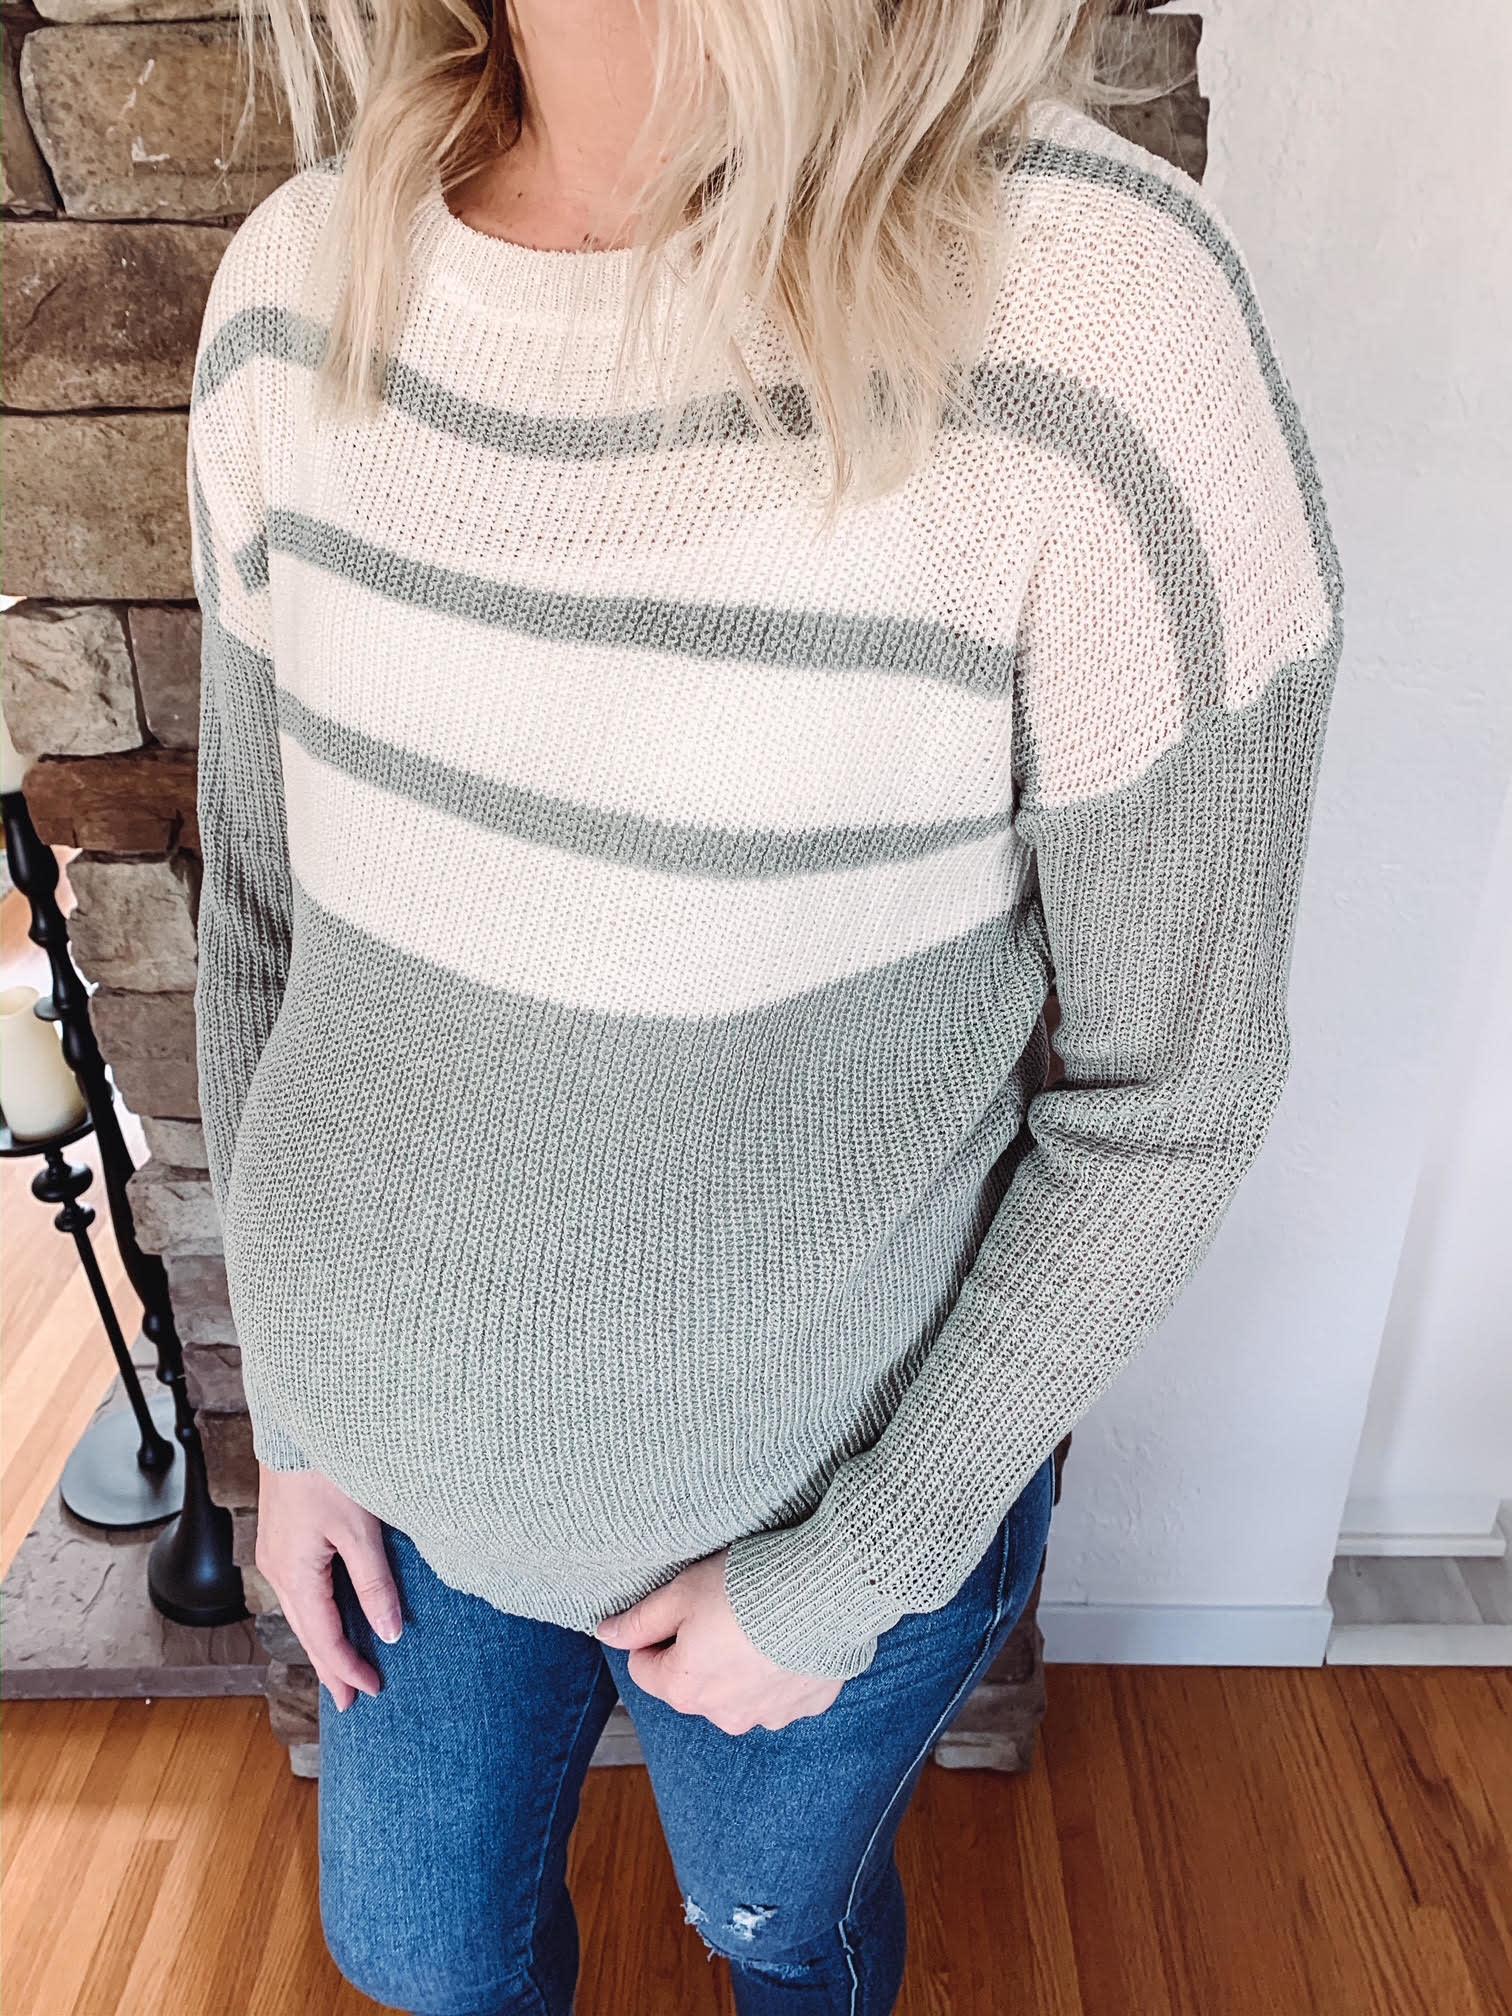 Misty Sage Sweater